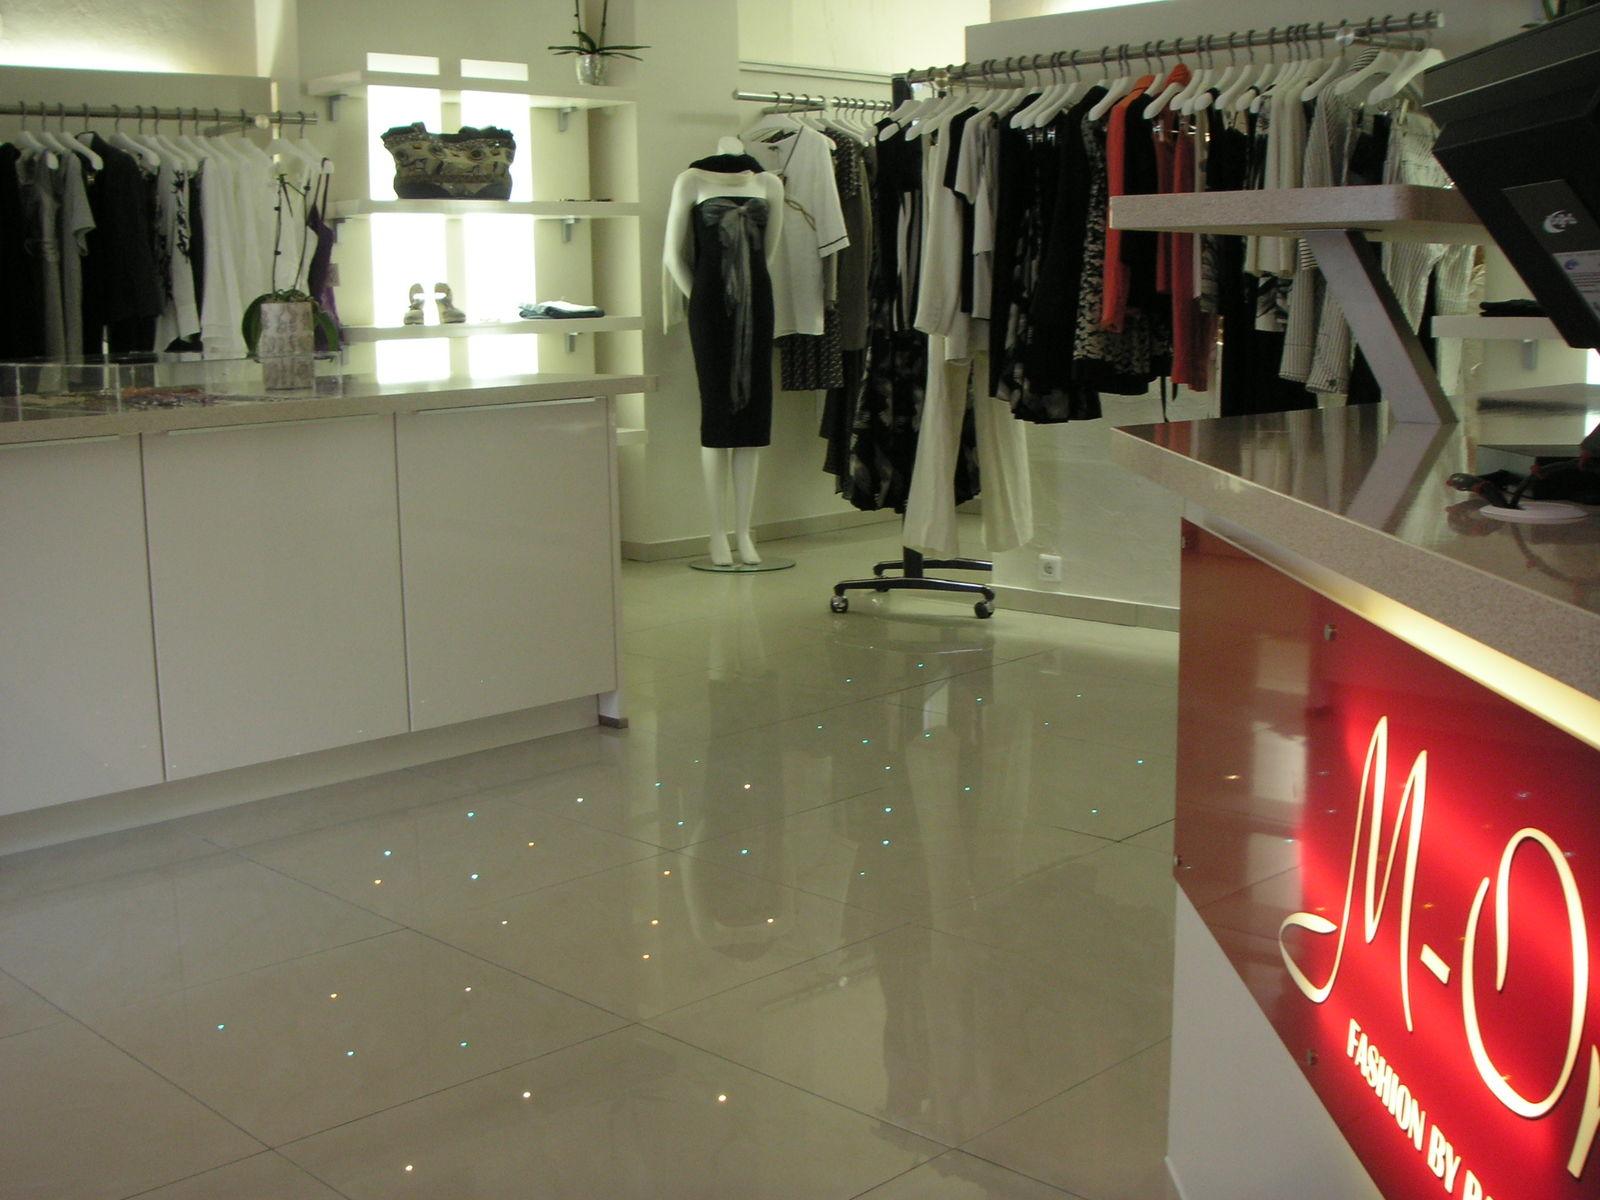 M-One Fashion in Berlin (Bild 1)